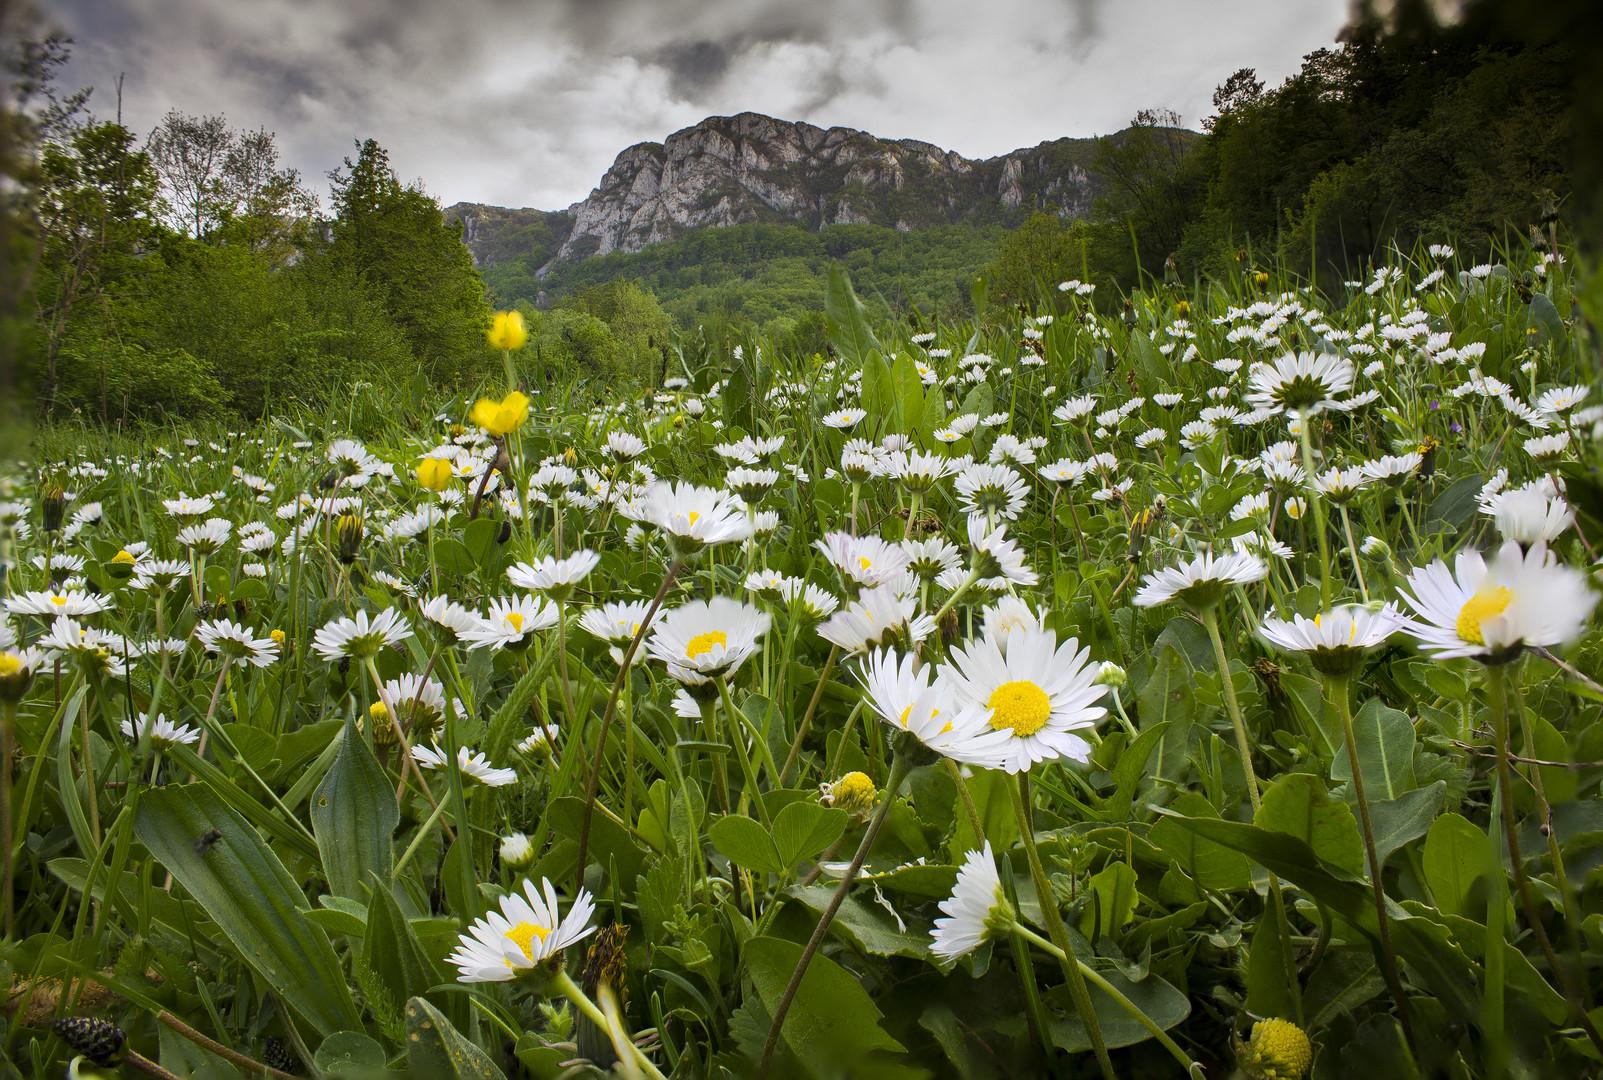 miris polja